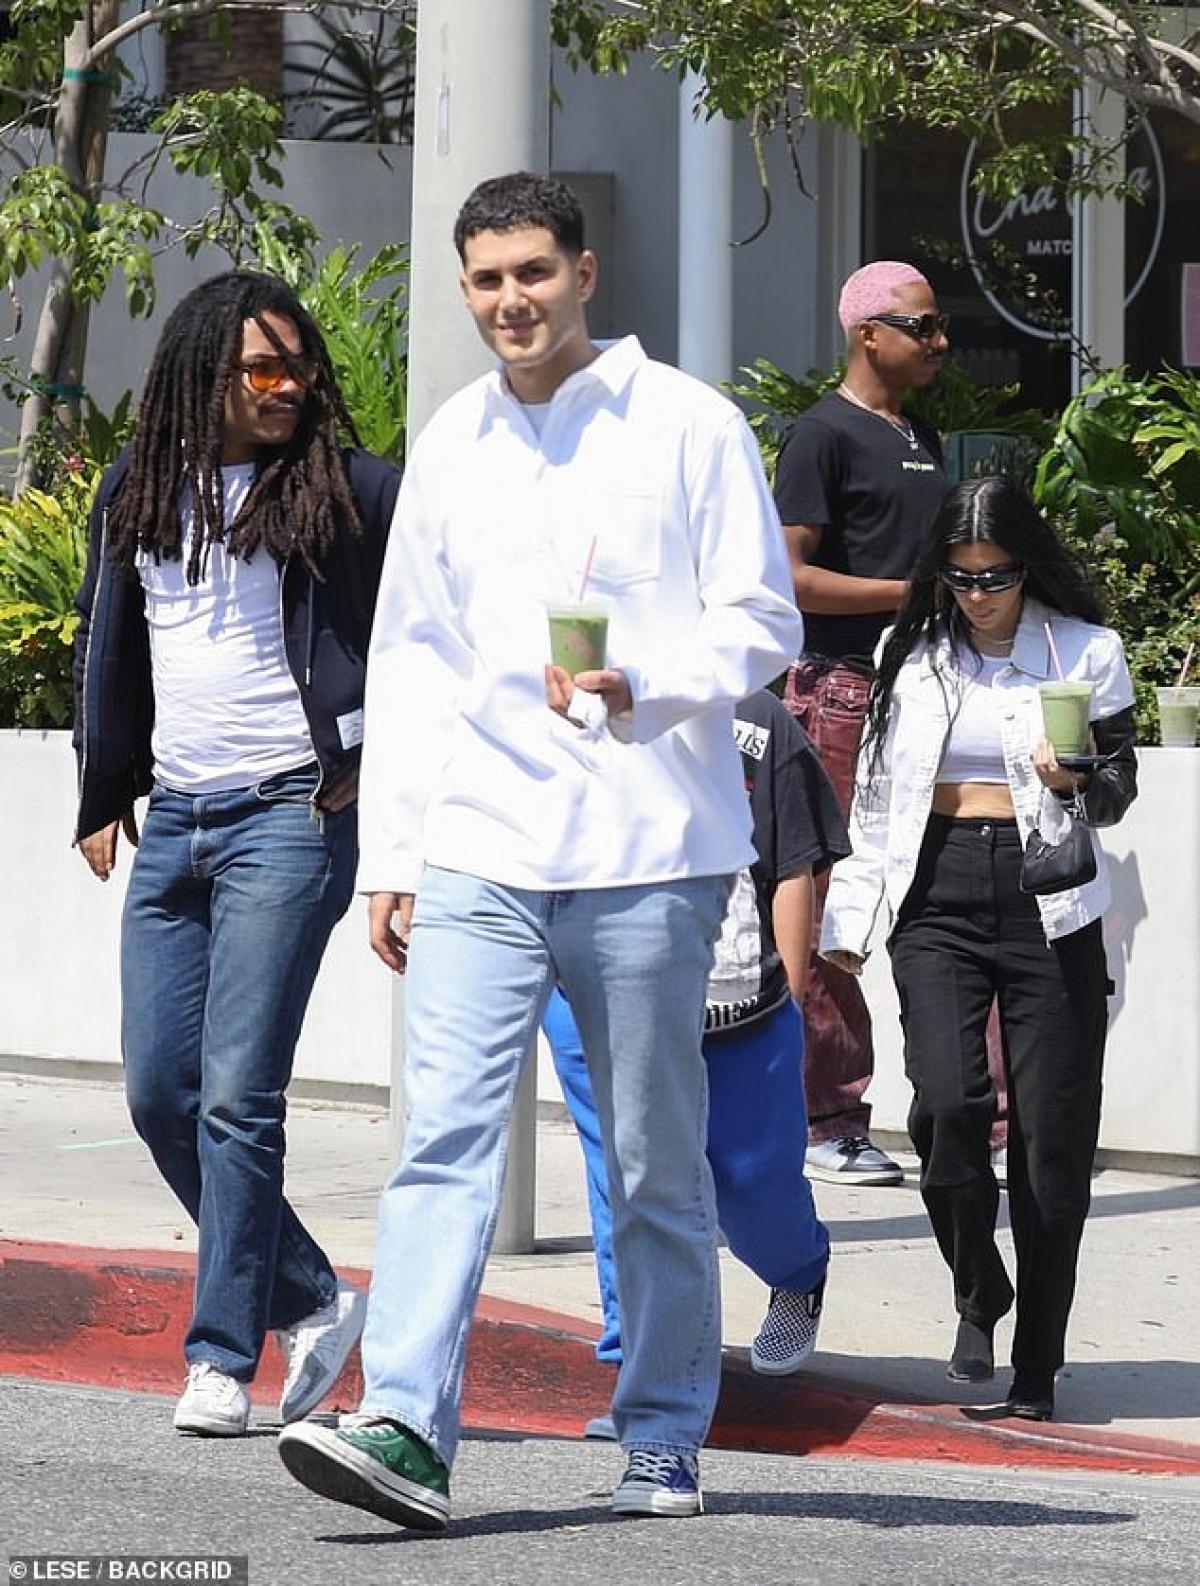 Kourtney Kardashian hiện đang hẹn hò với Travis Barker.